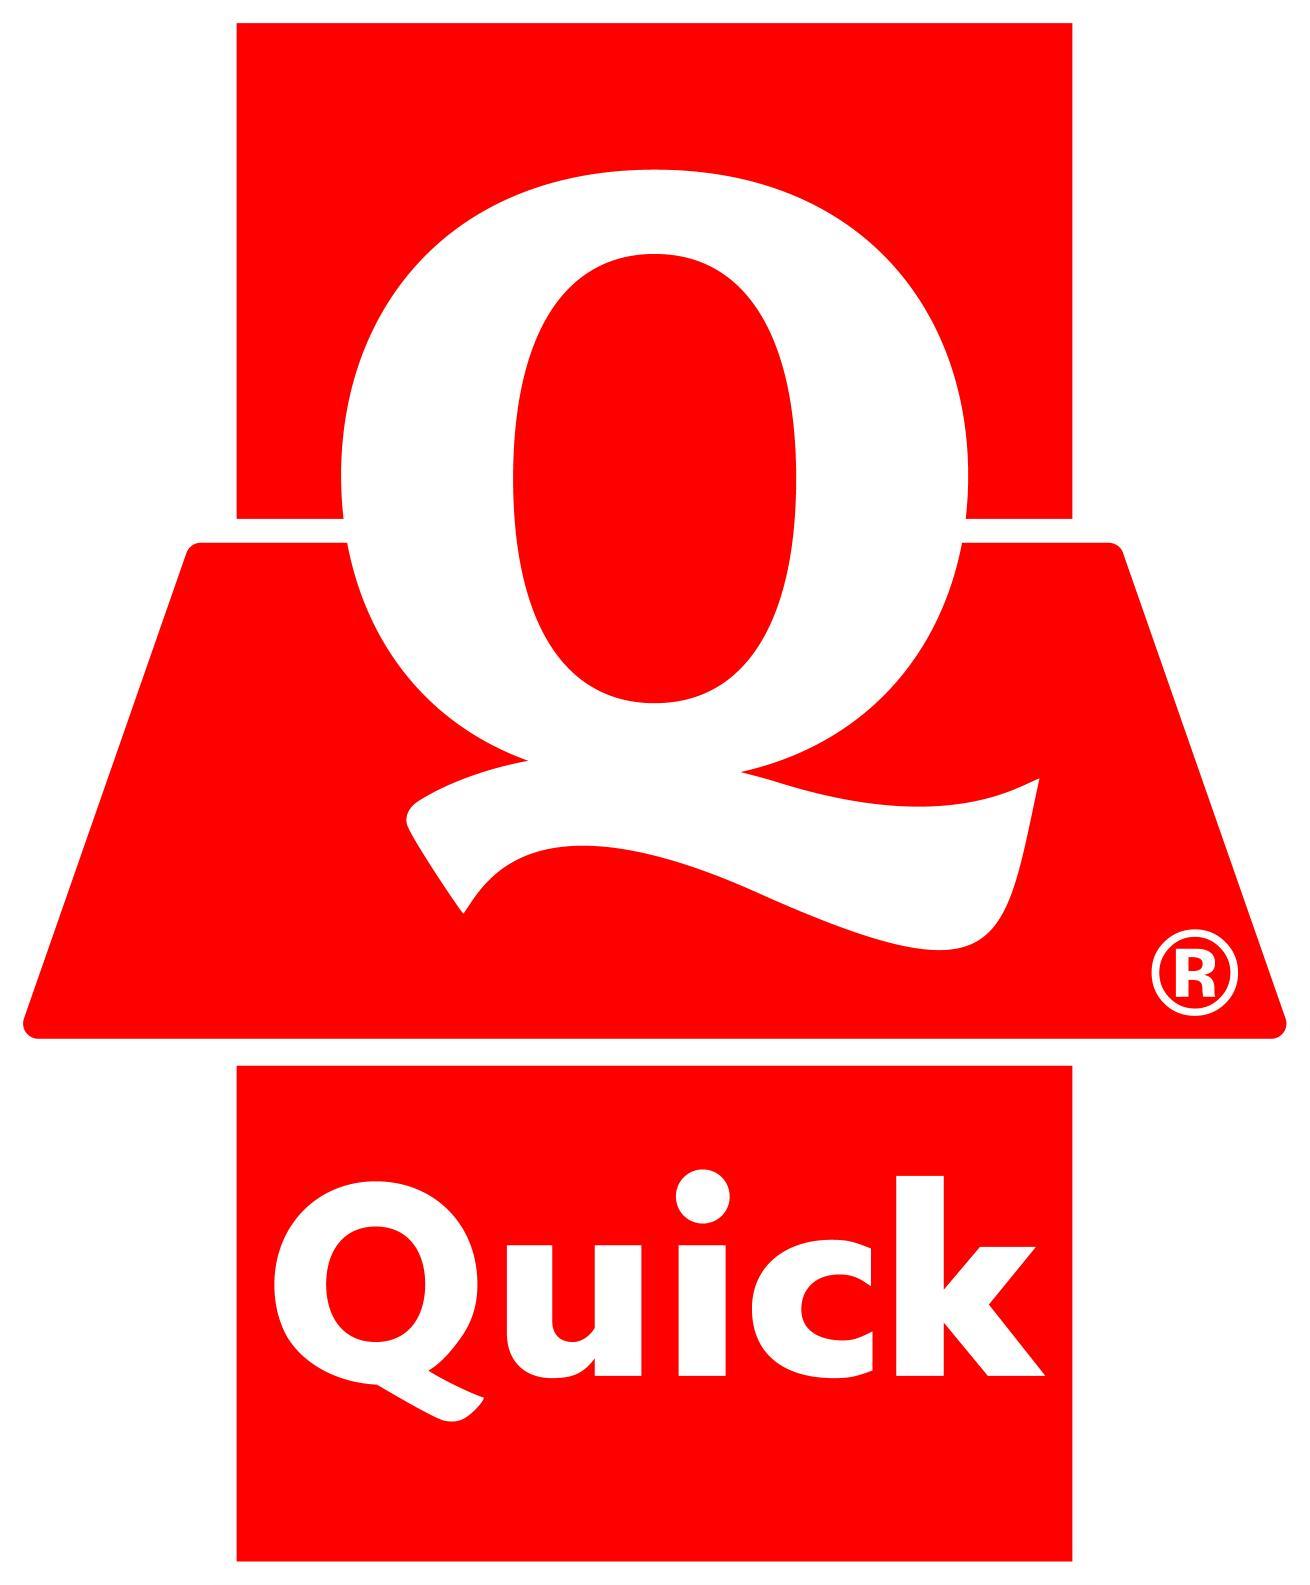 quick recrute sur qapa